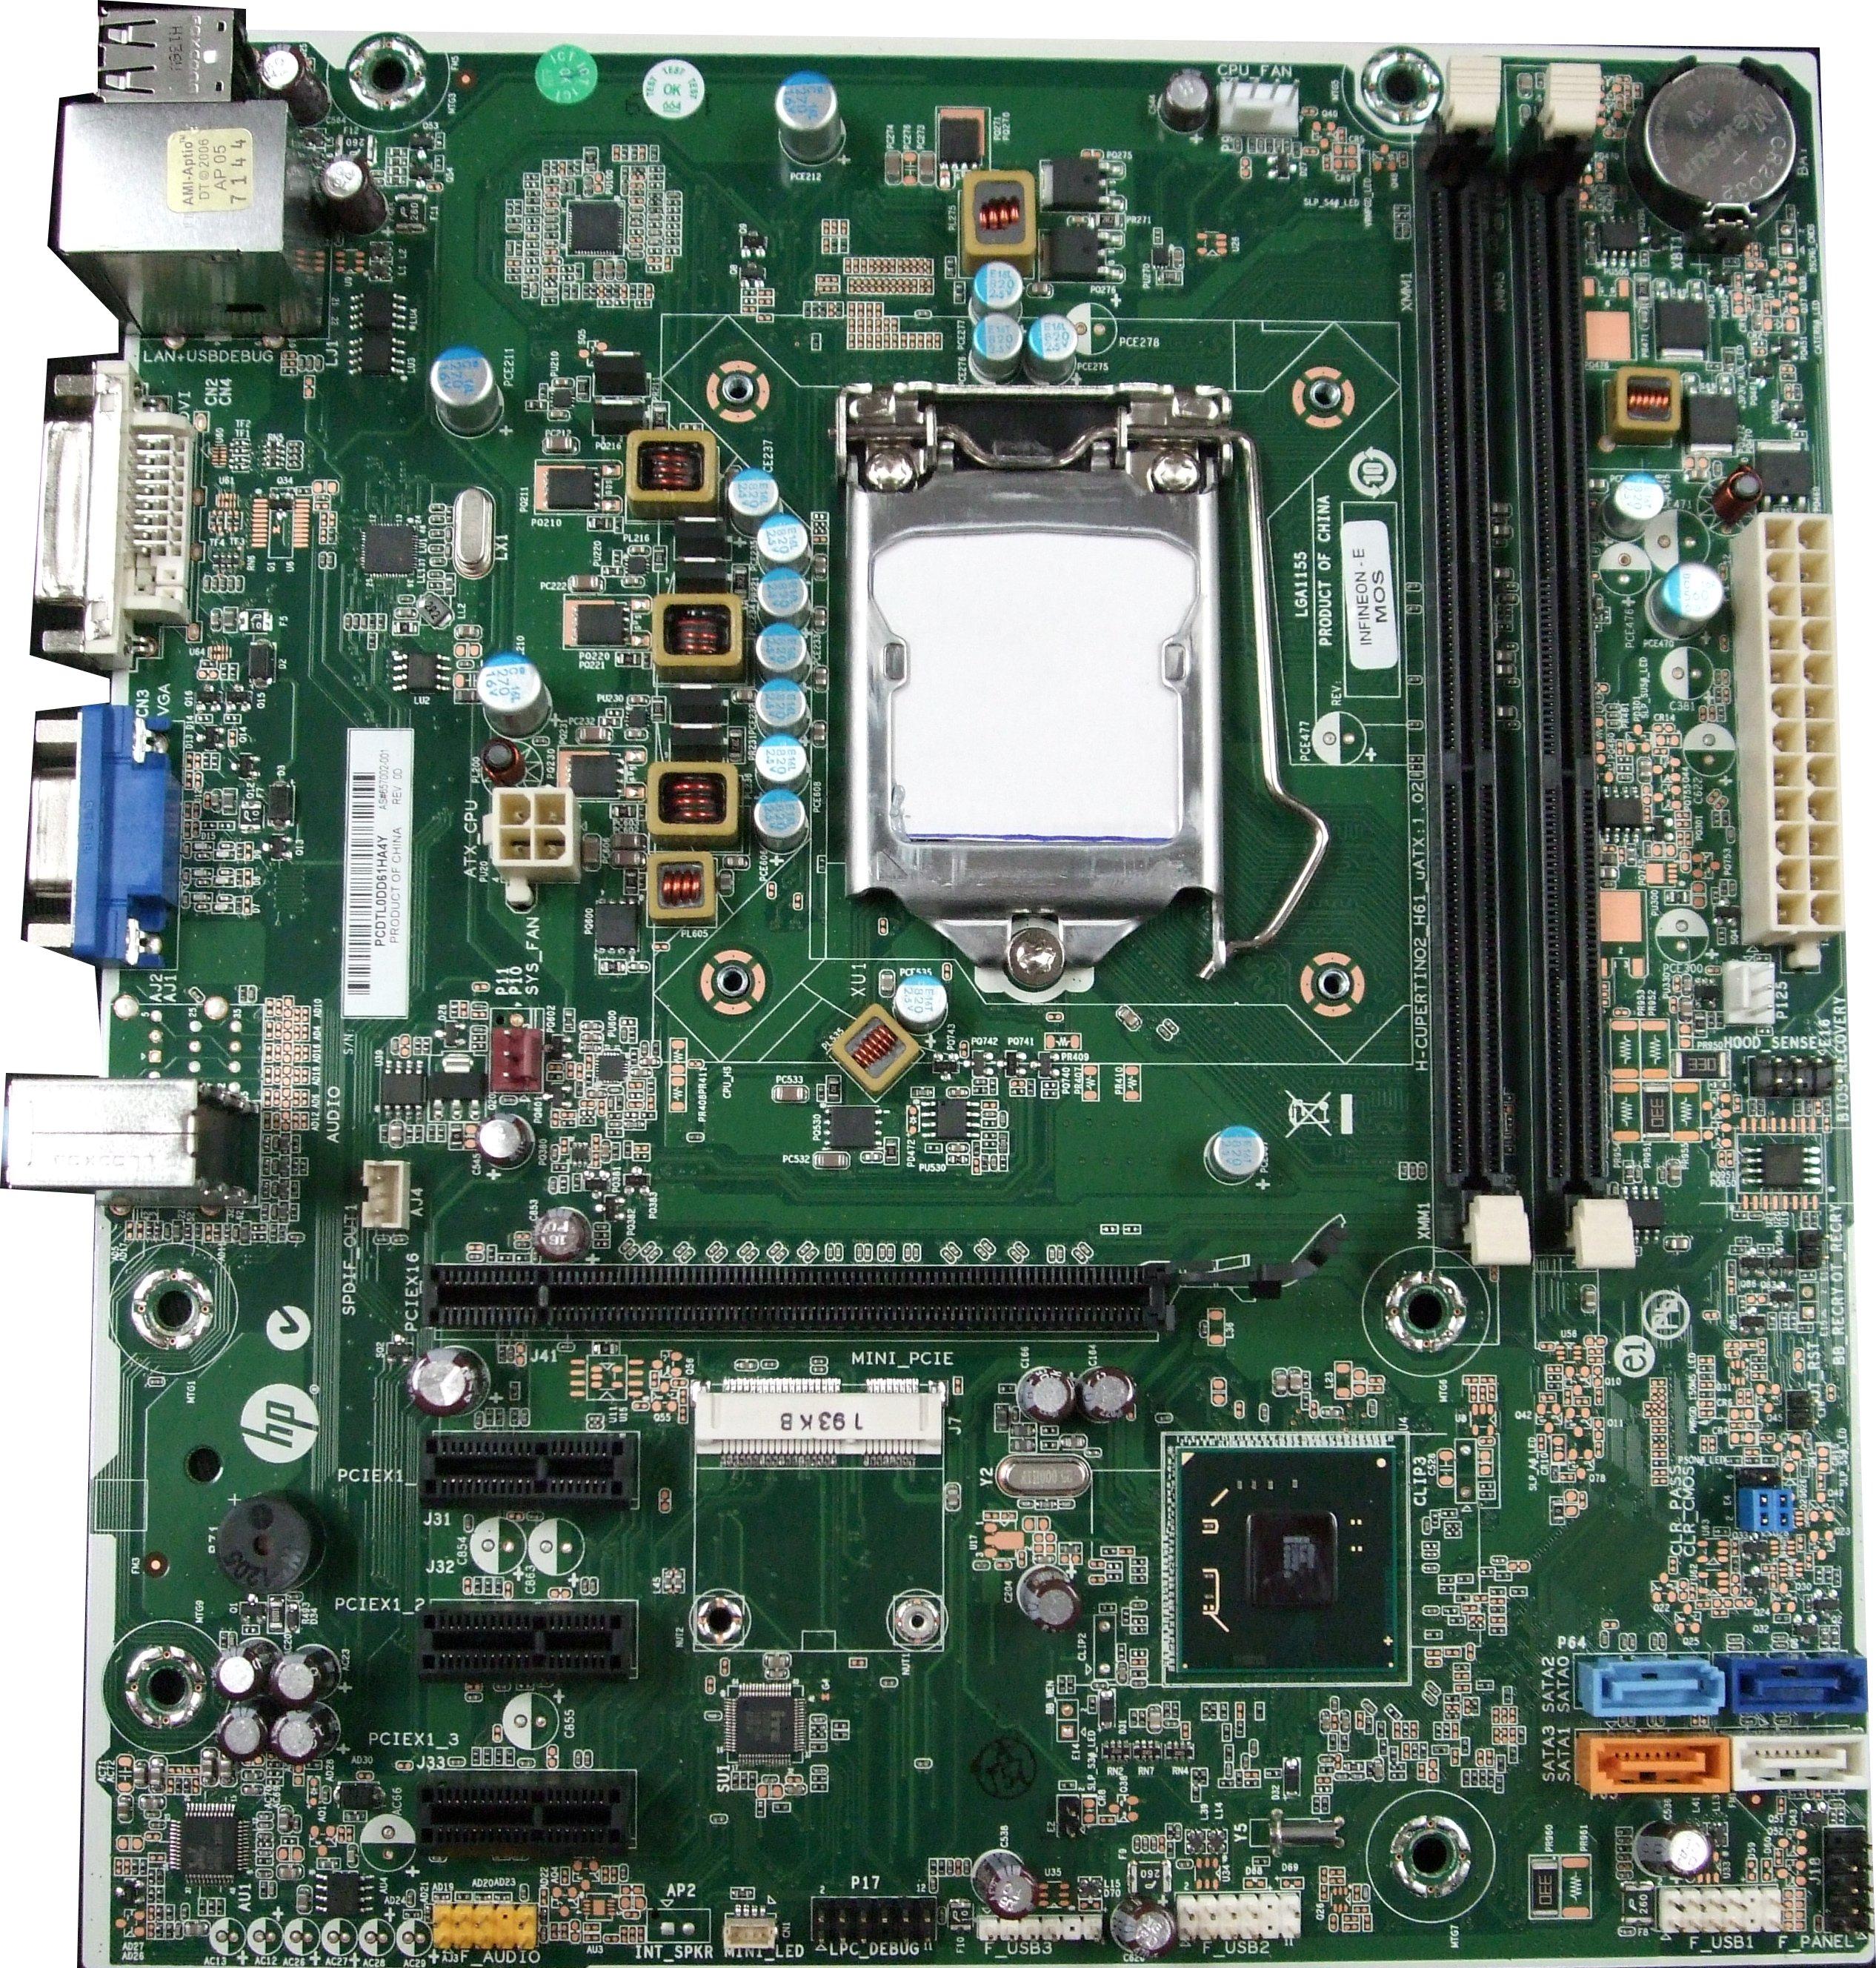 UNTESTED HP 657002-001 Infinion - E Socket LGA1155 Motherboard